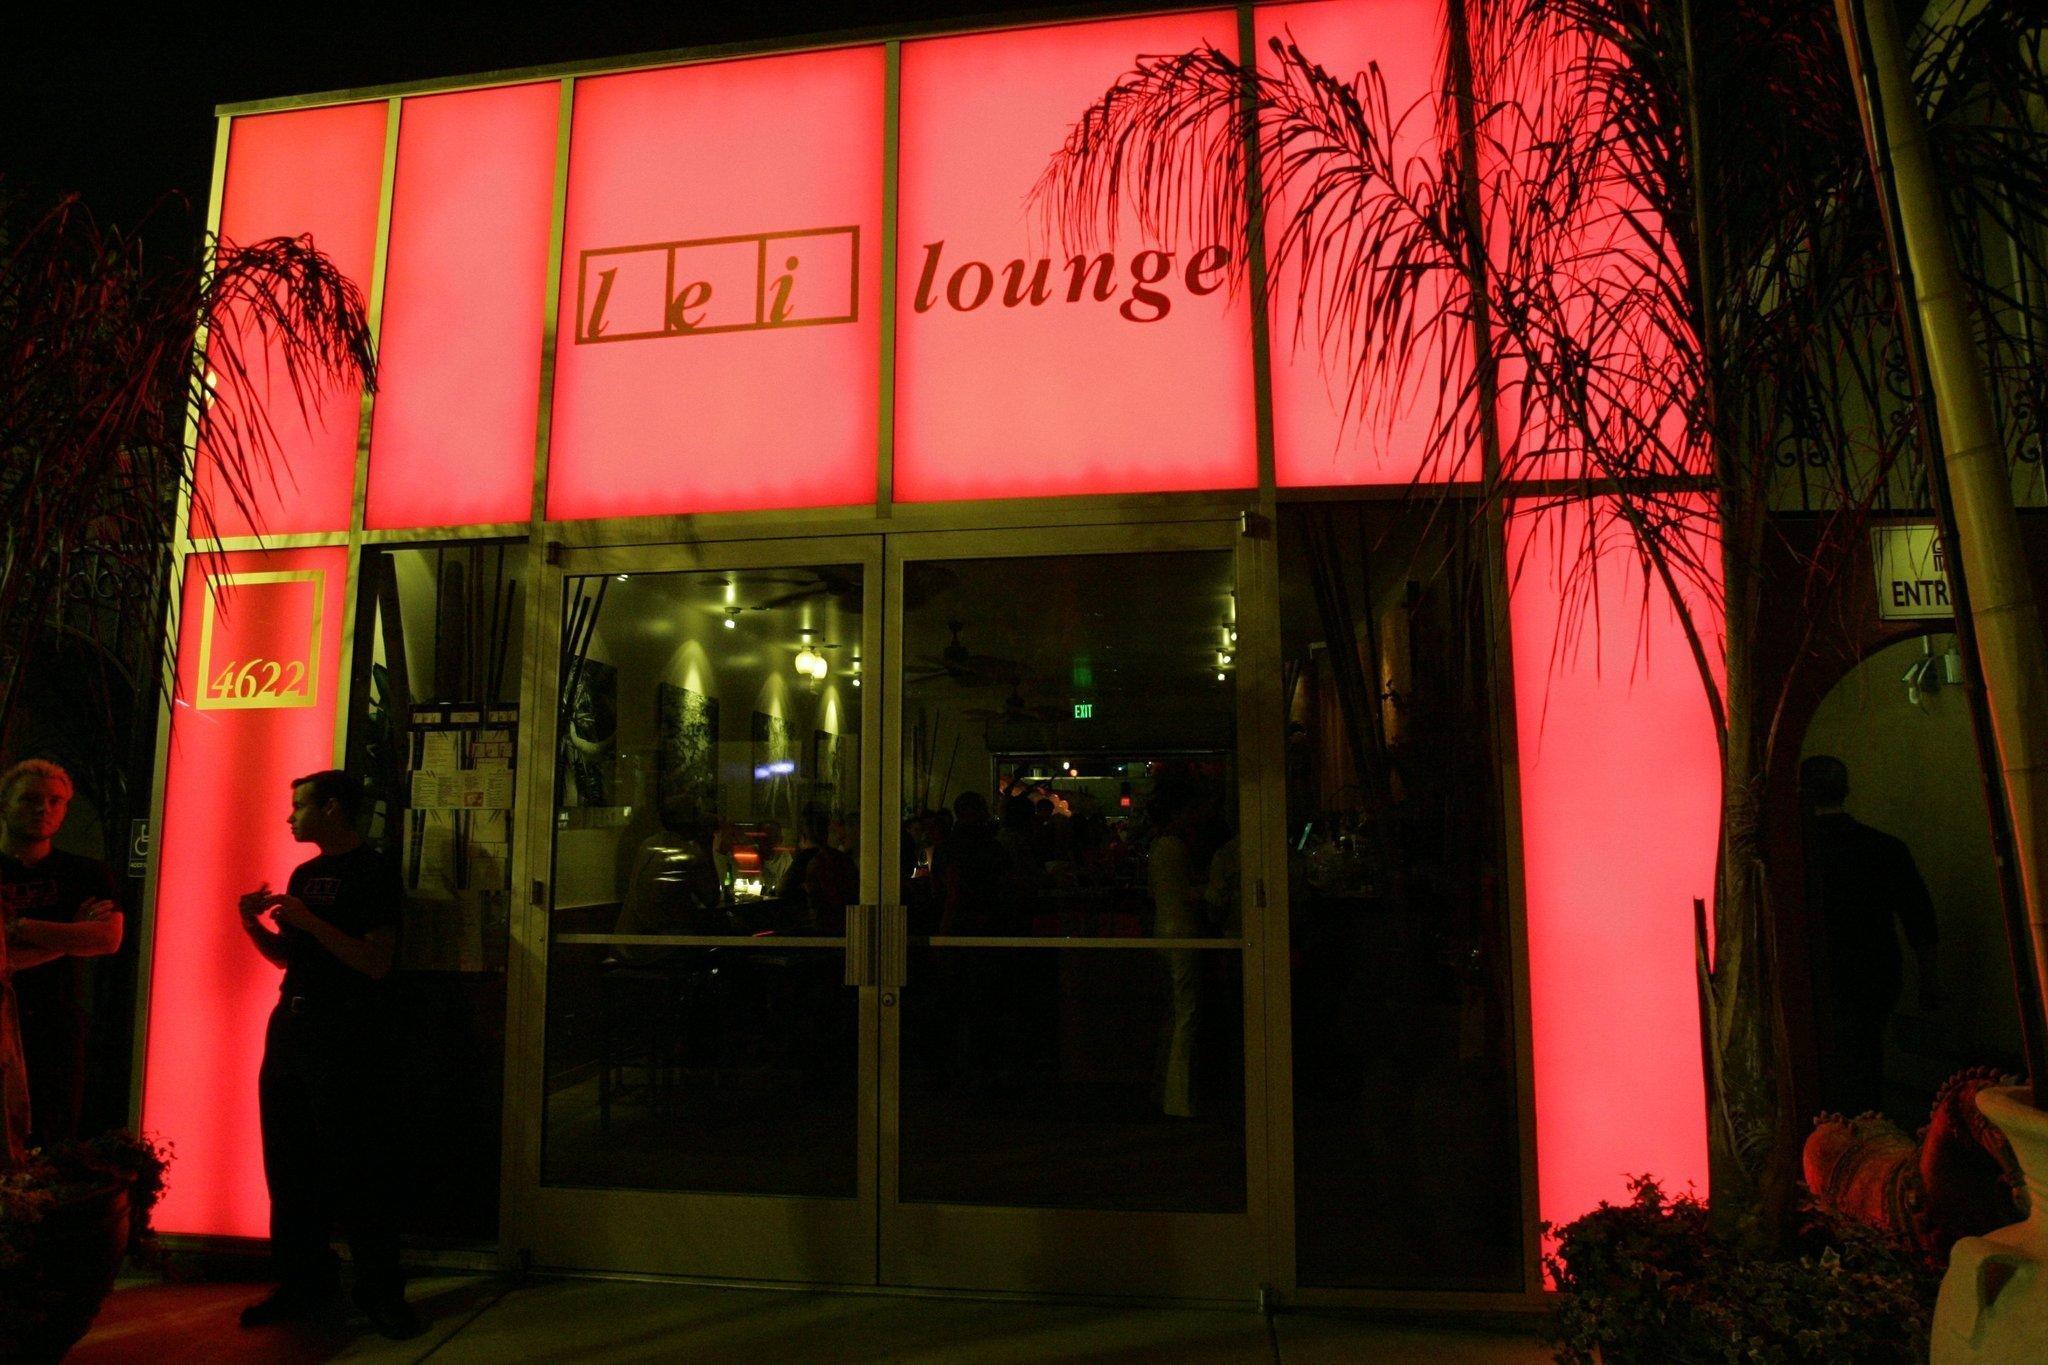 Bourbon Street Lei Lounge Shuttered The San Diego Union Tribune